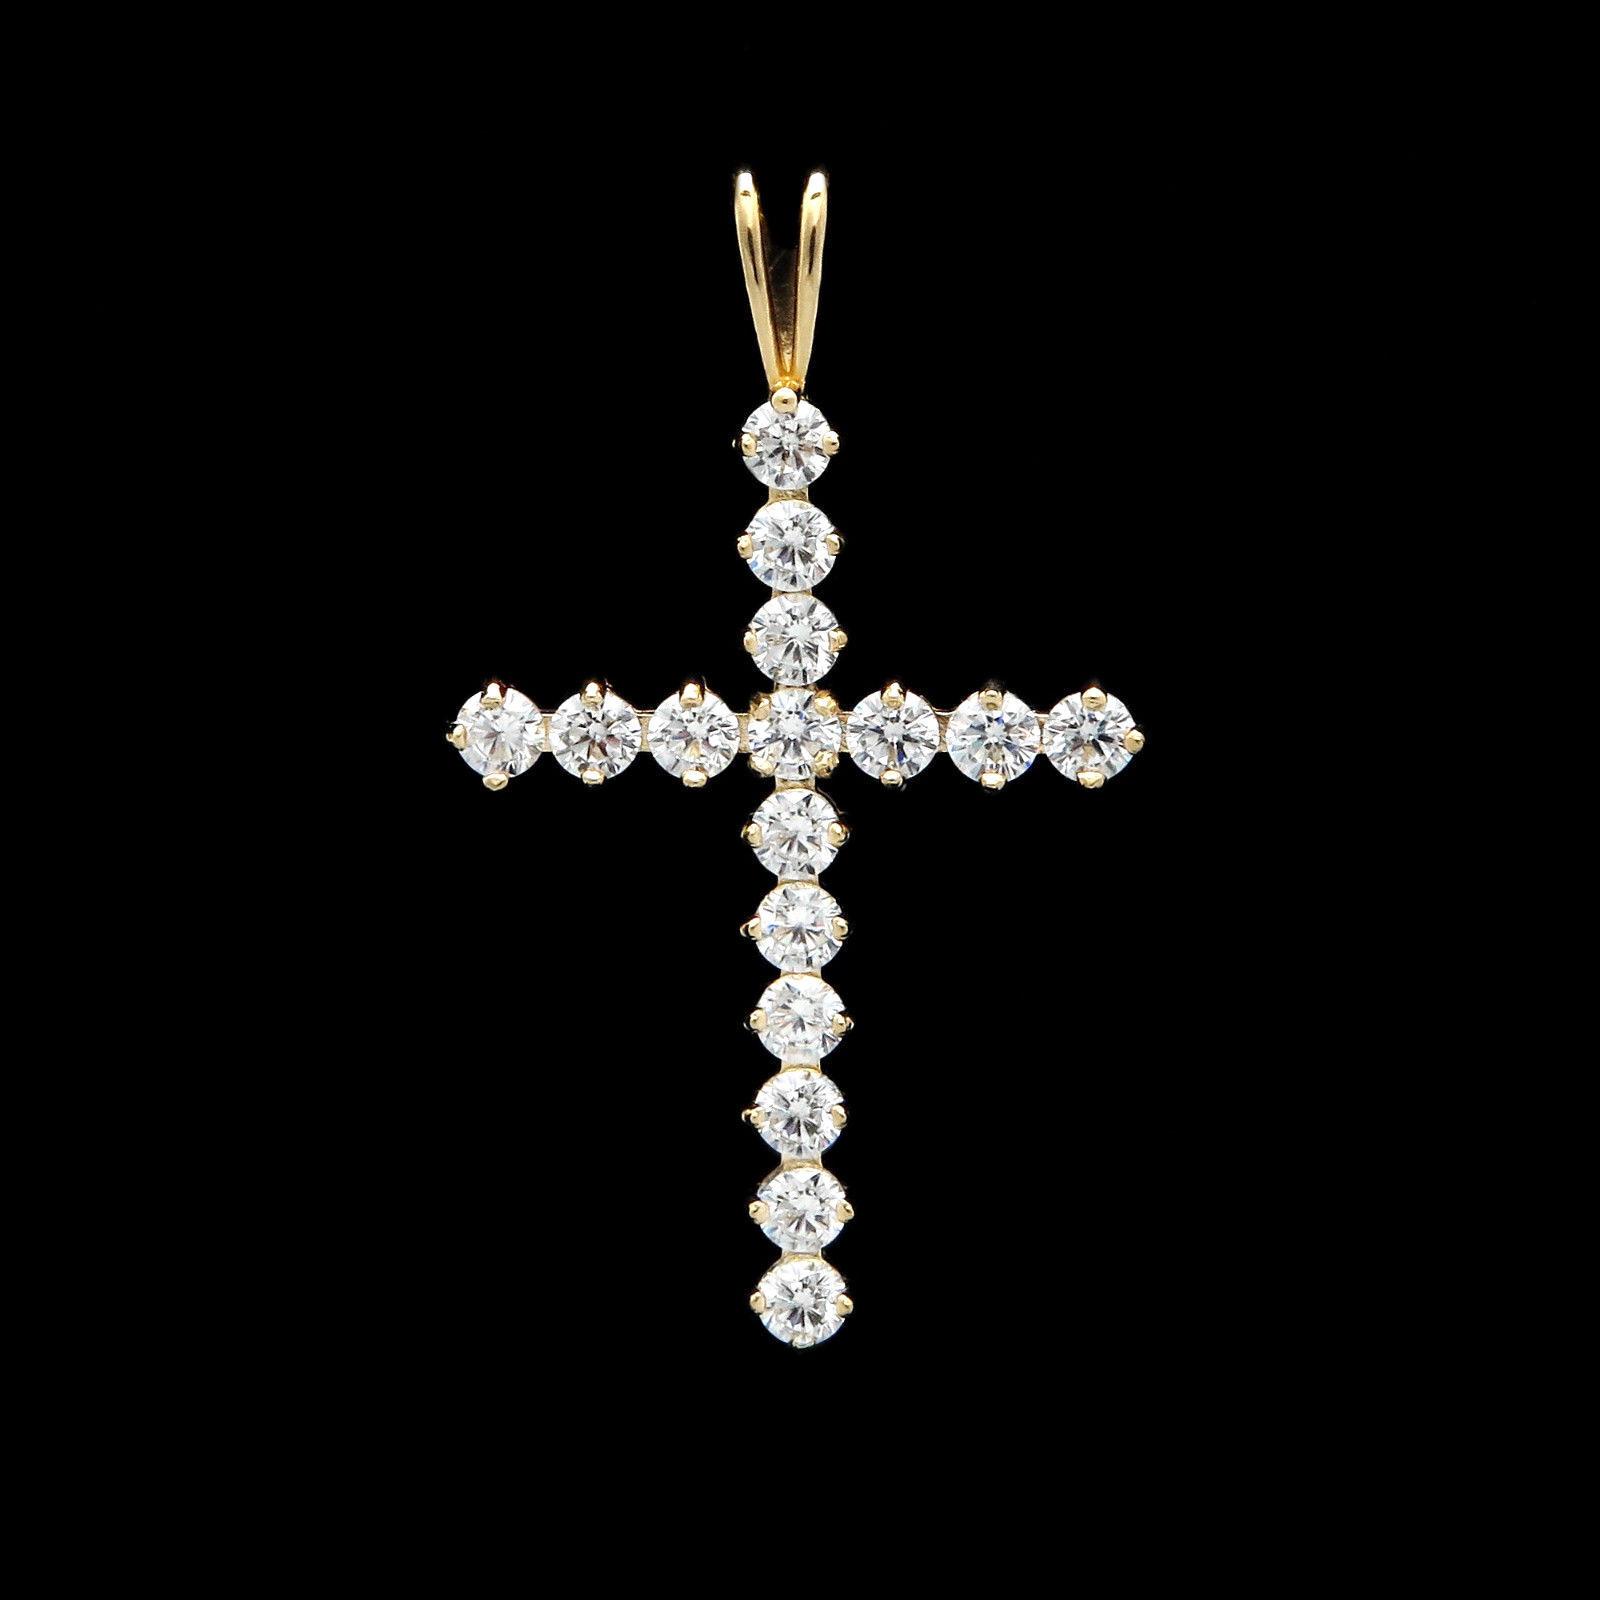 0.96tcw Brilliant Round Created Diamond Cross Pendant 14K Yellow gold Charm